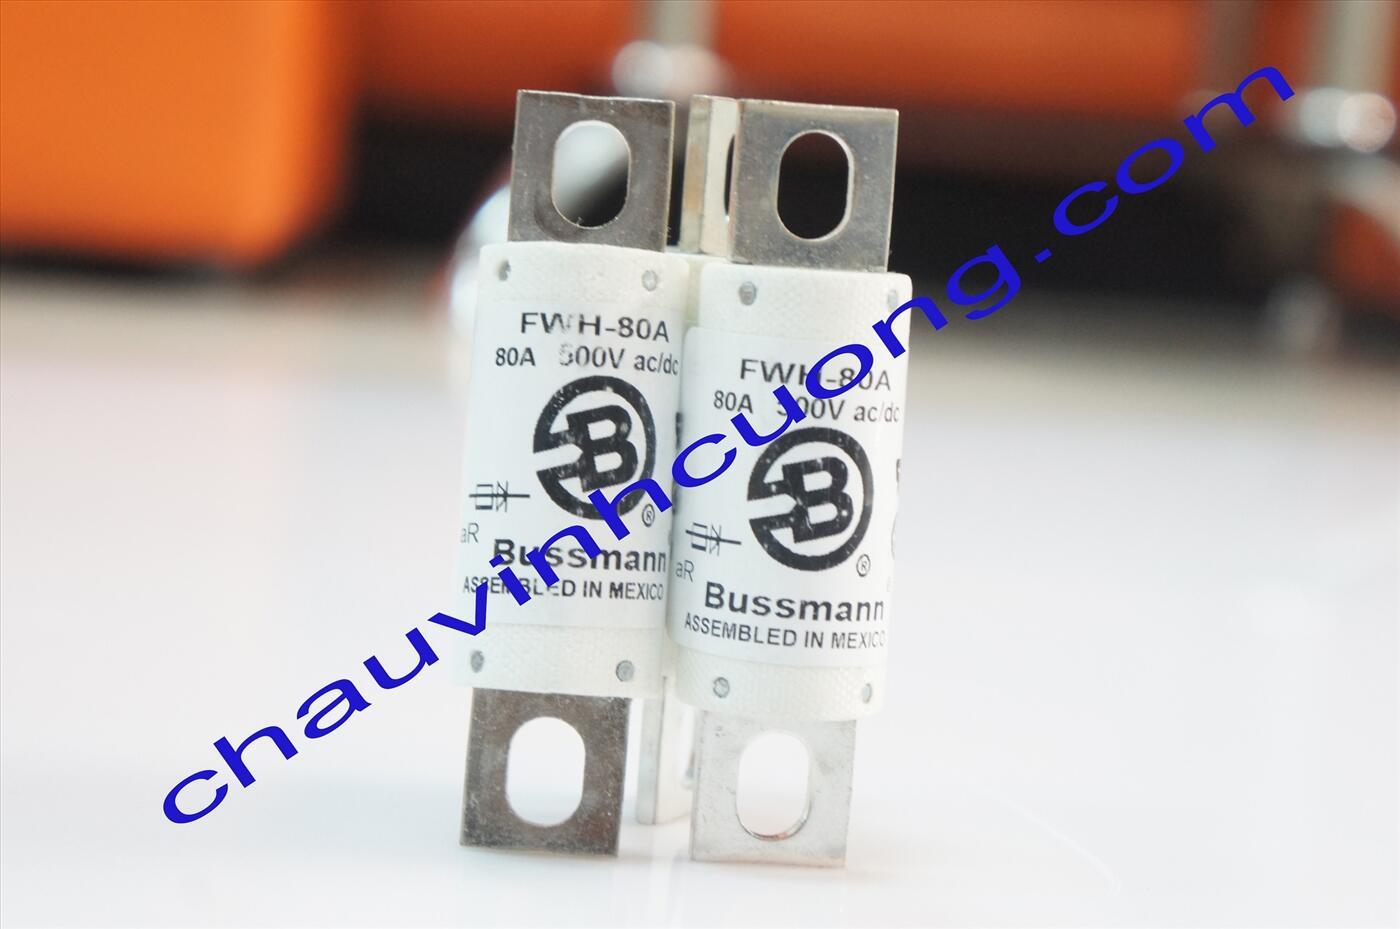 Cầu Chì Bussmann FWH-80A